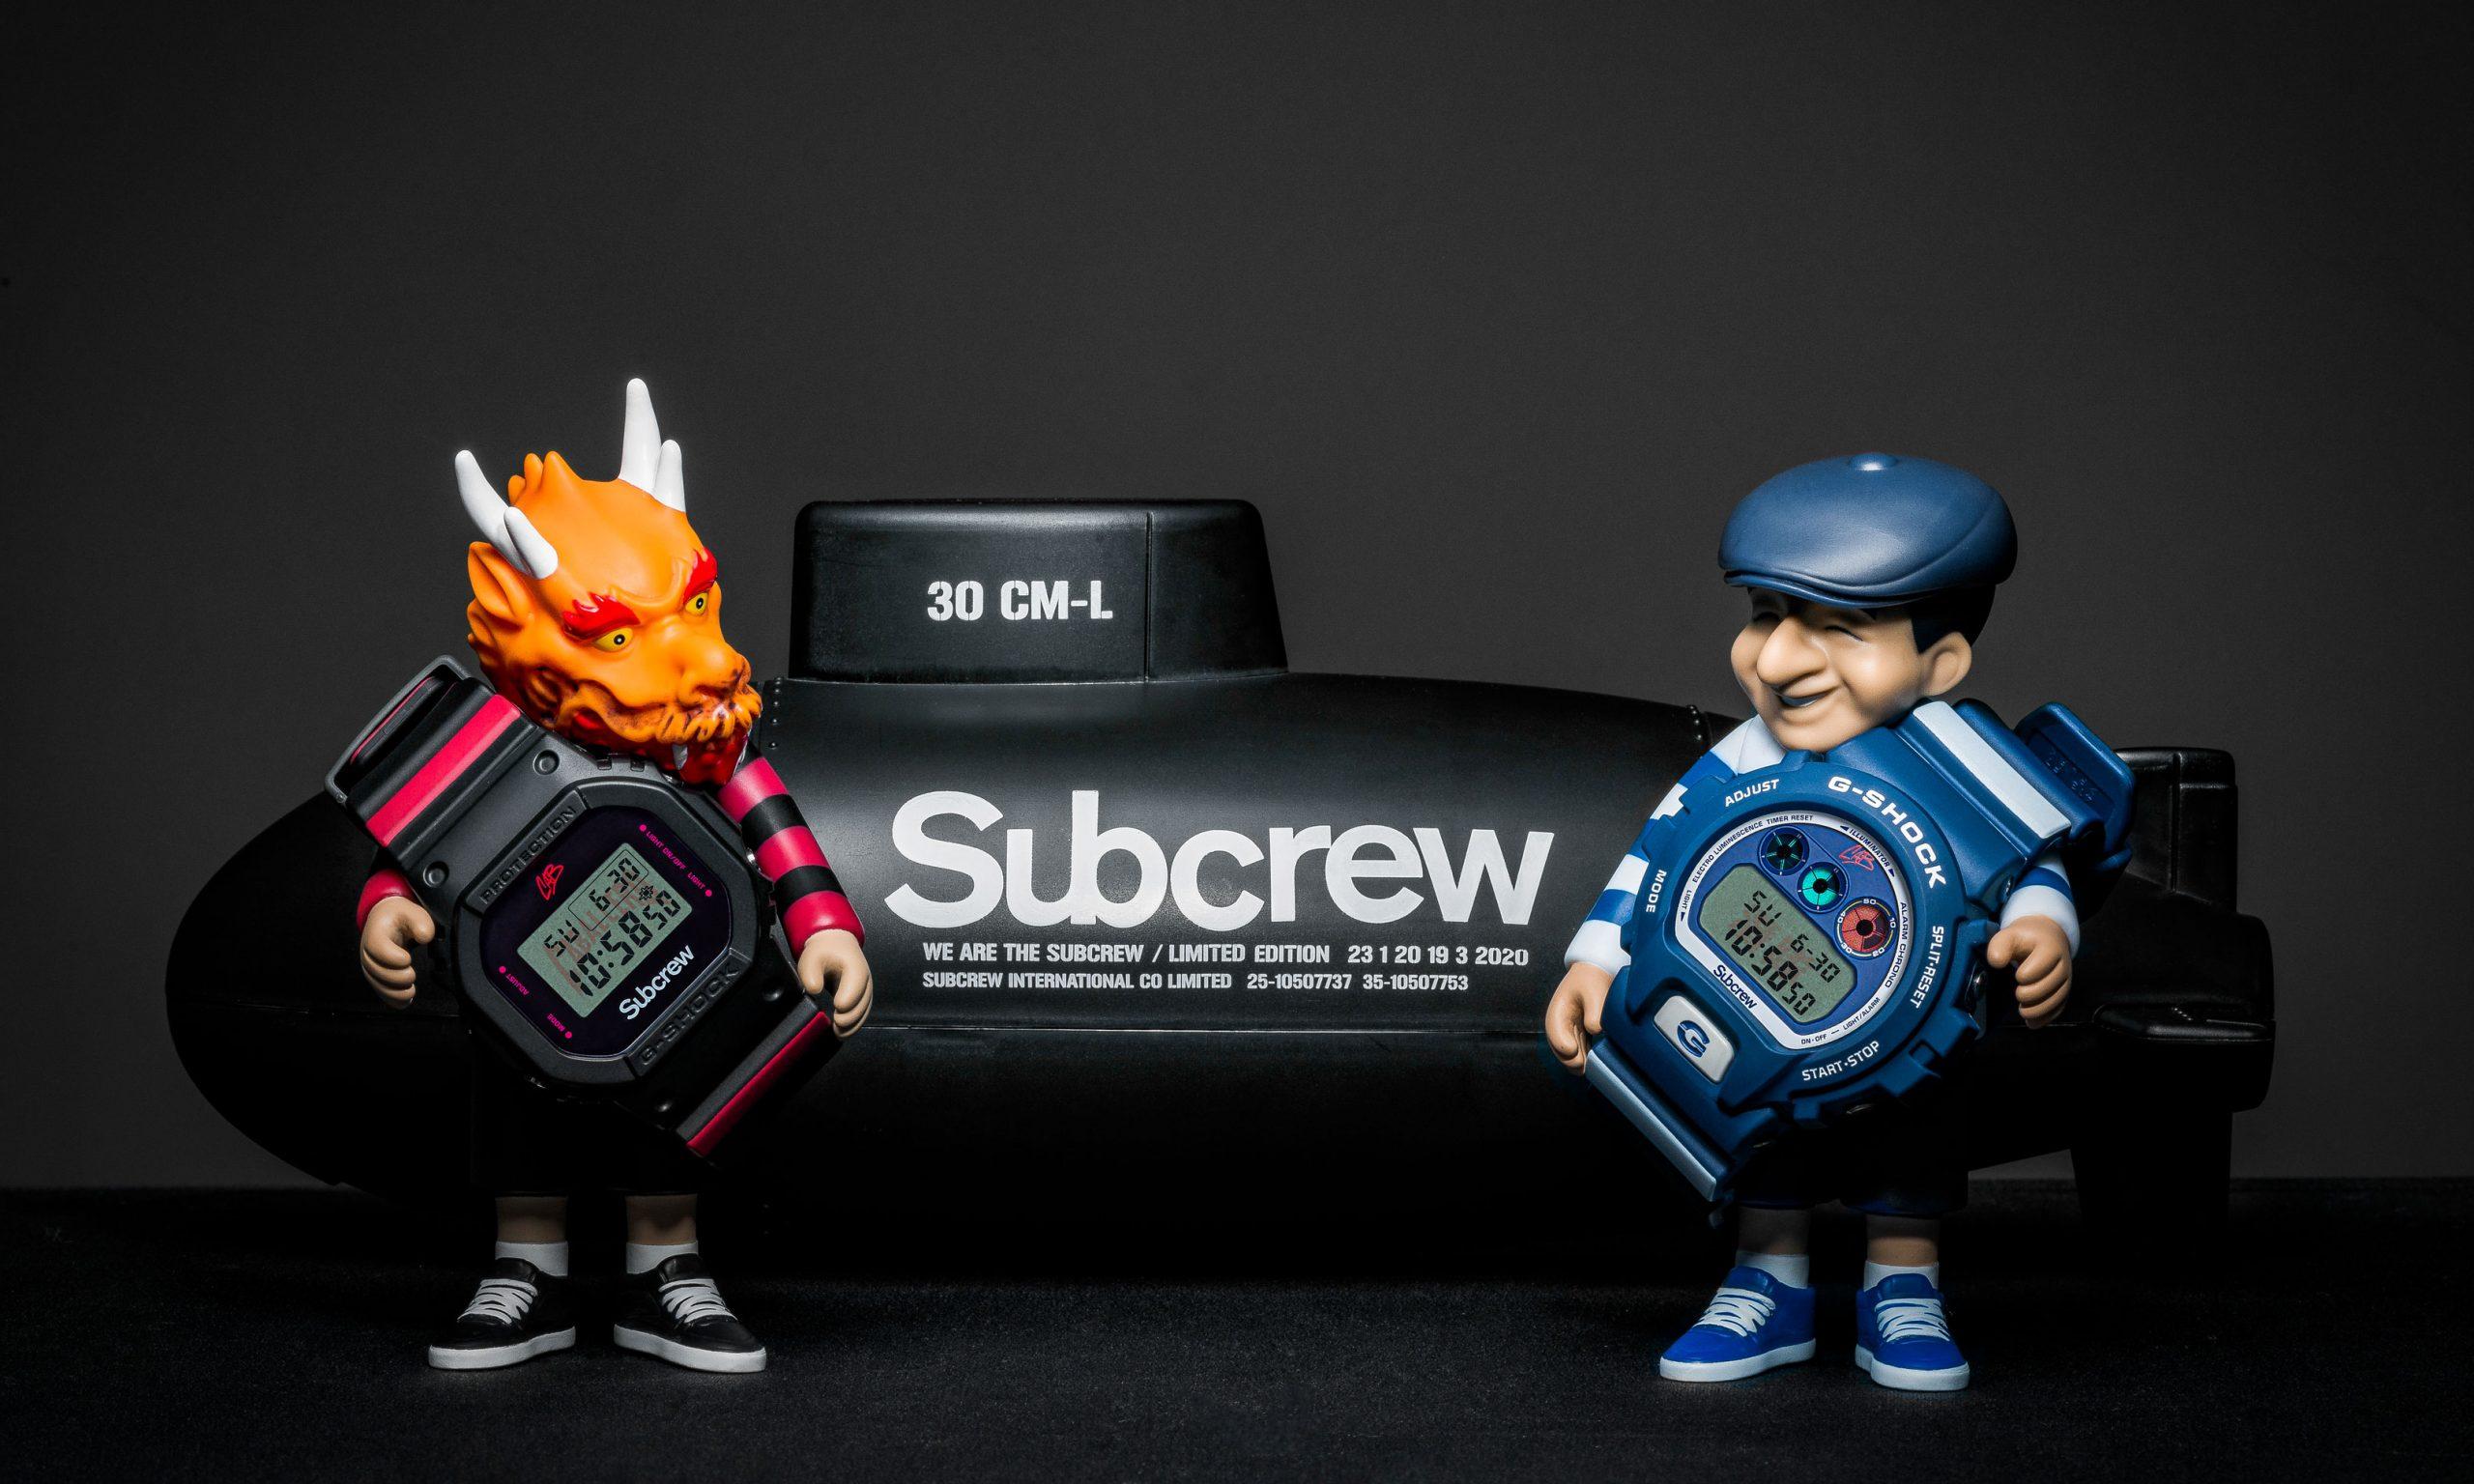 G-SHOCK x SUBCREW x STEVE CABALLERO 三方联名重磅登场